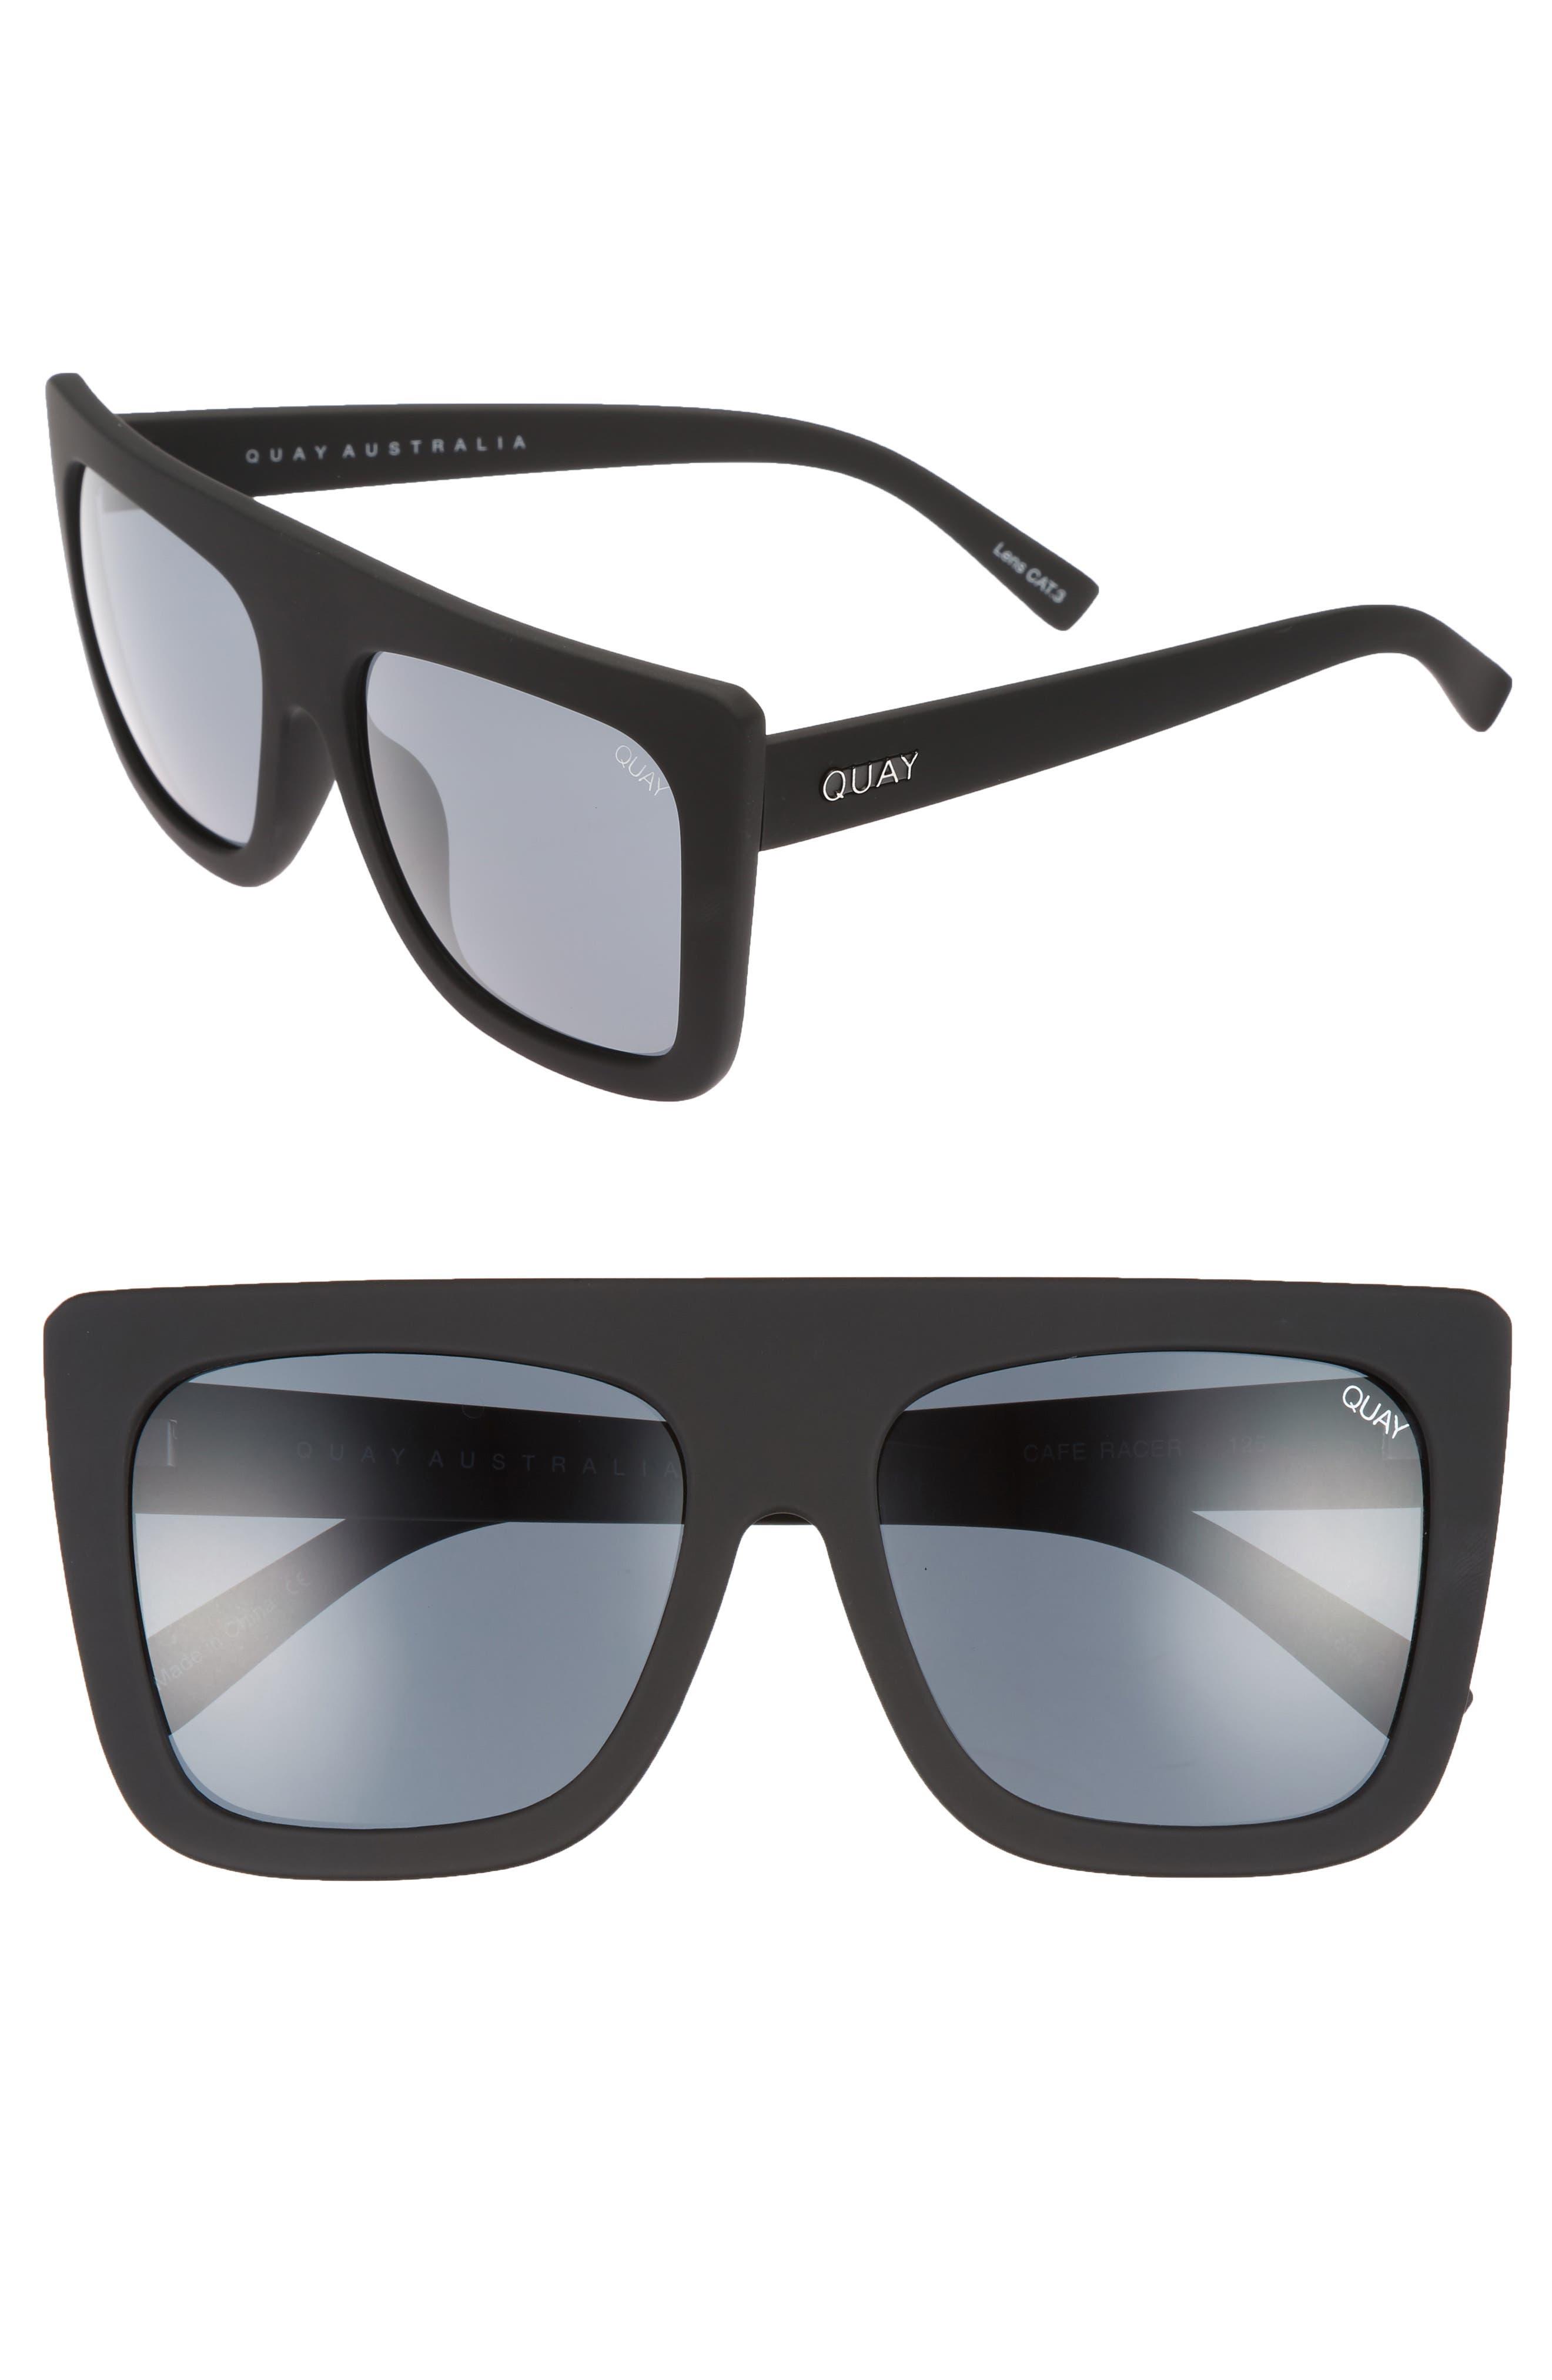 Cafe Racer 55mm Square Sunglasses,                         Main,                         color, Black/ Smoke